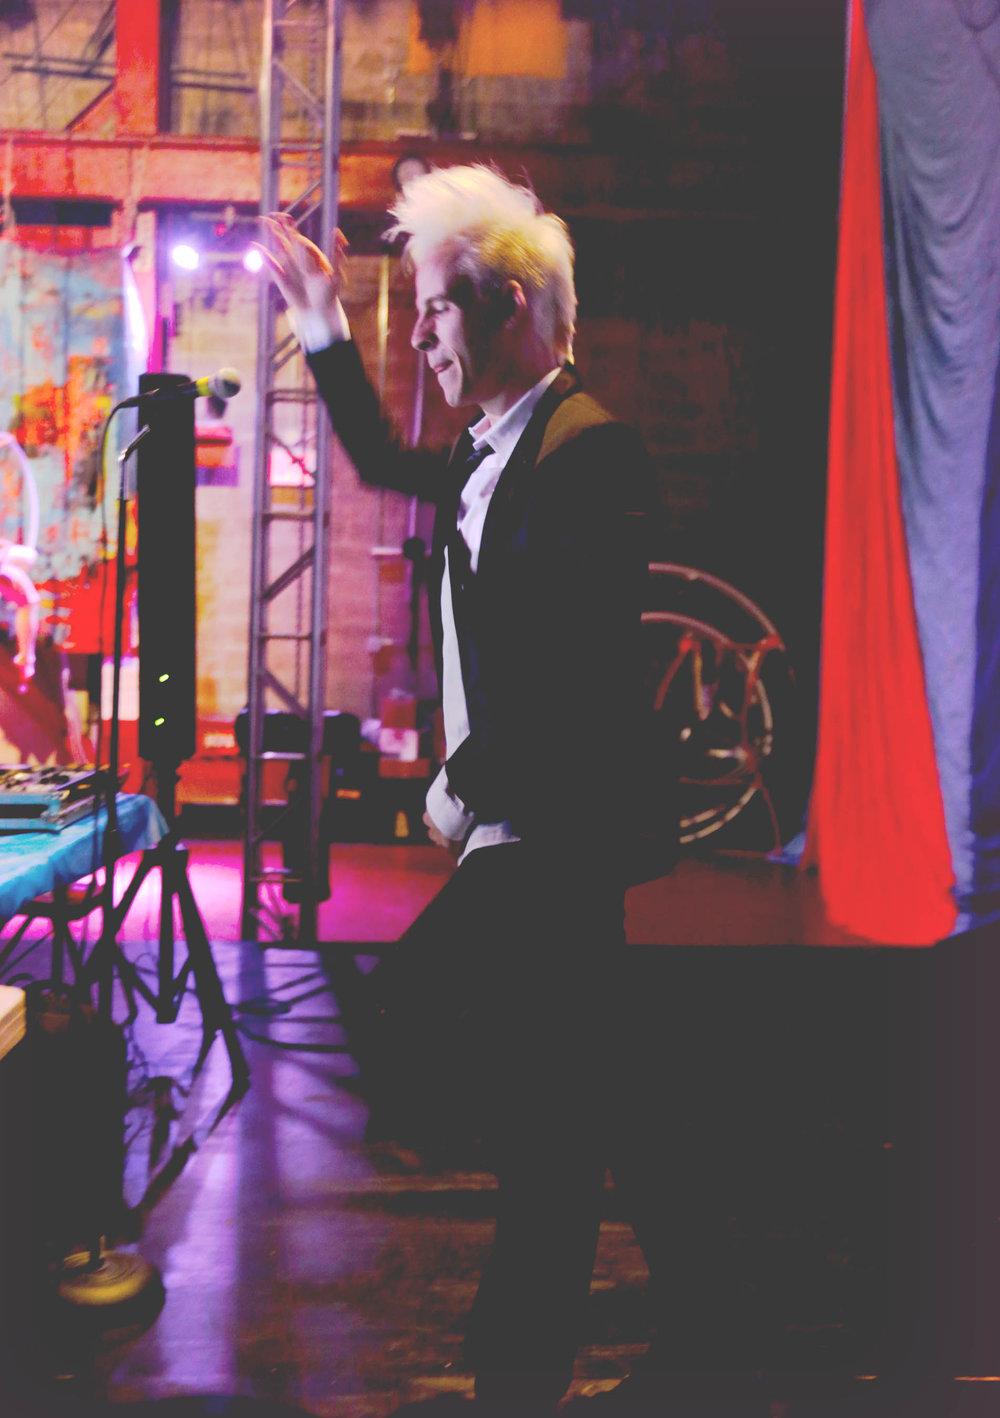 dancing1_daydream.jpg